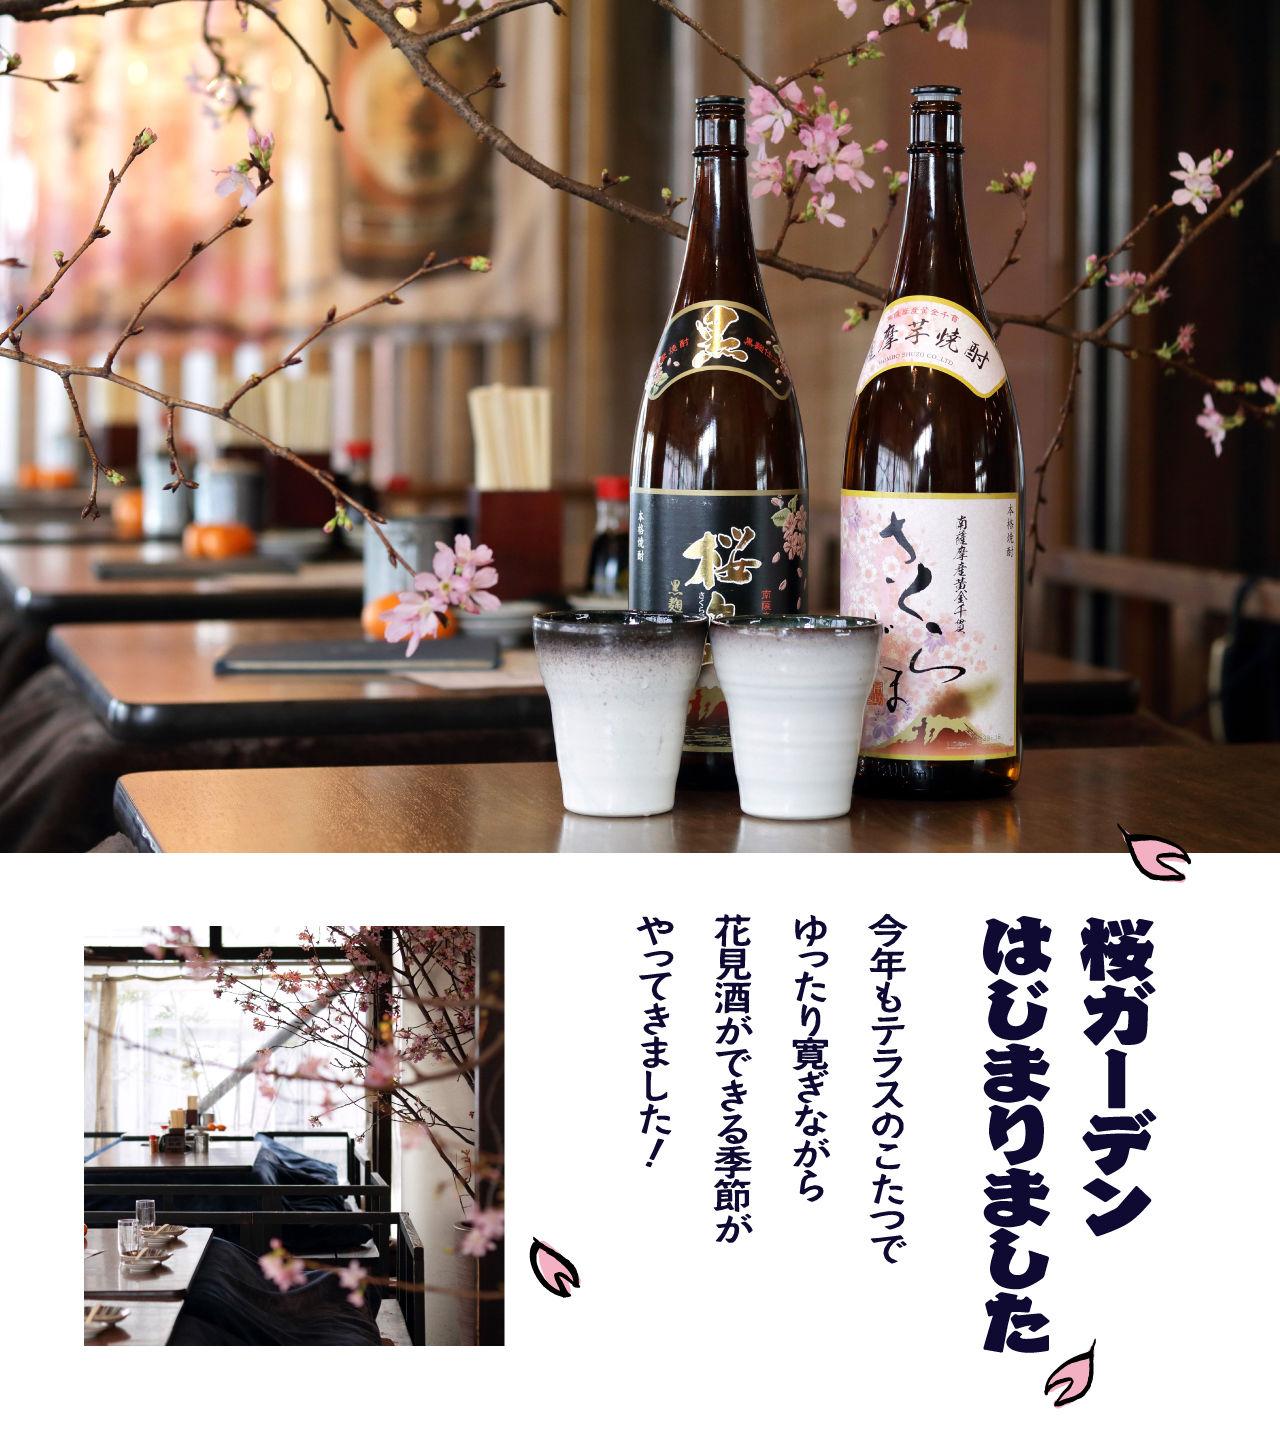 kanoya_1903_sakura.jpg